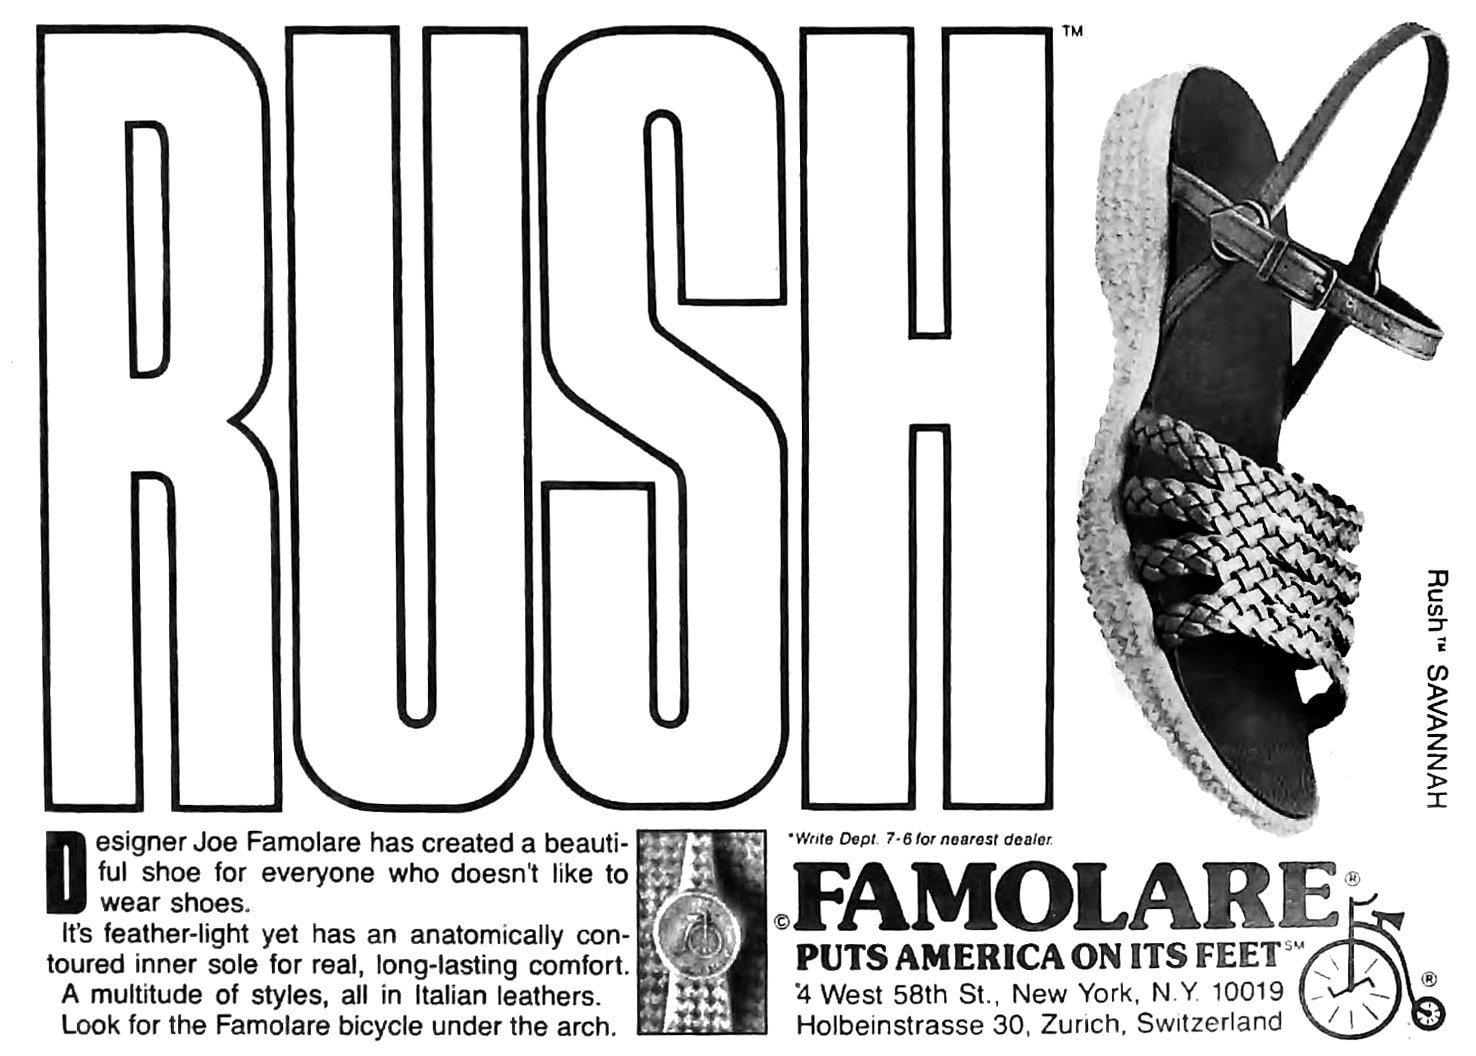 The Rush Savannah shoe from Famolare (1978)